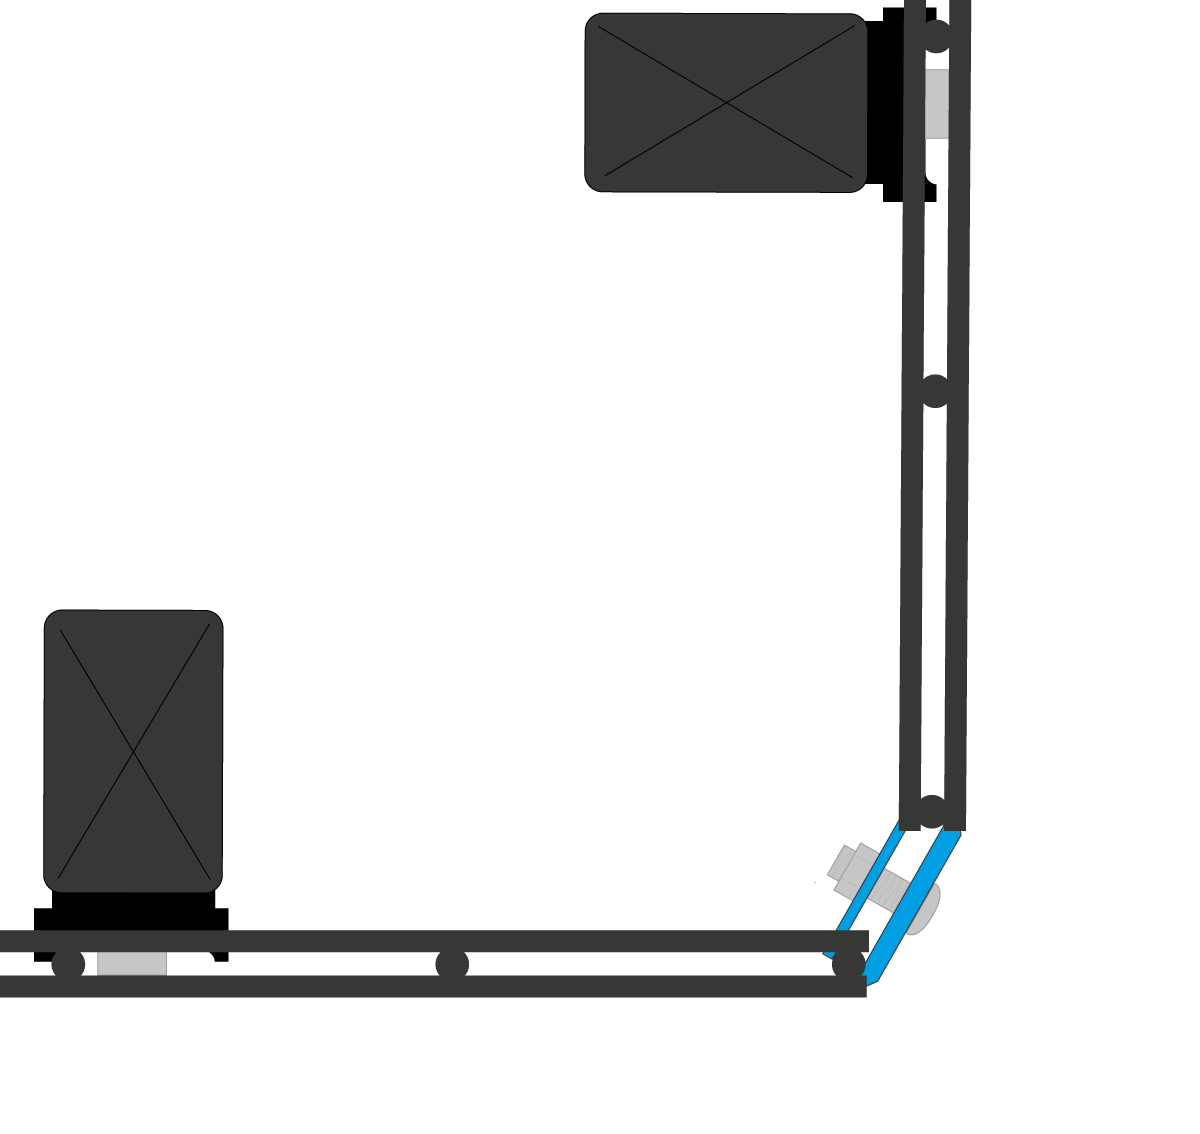 Anbau-Variante Eckverbinder